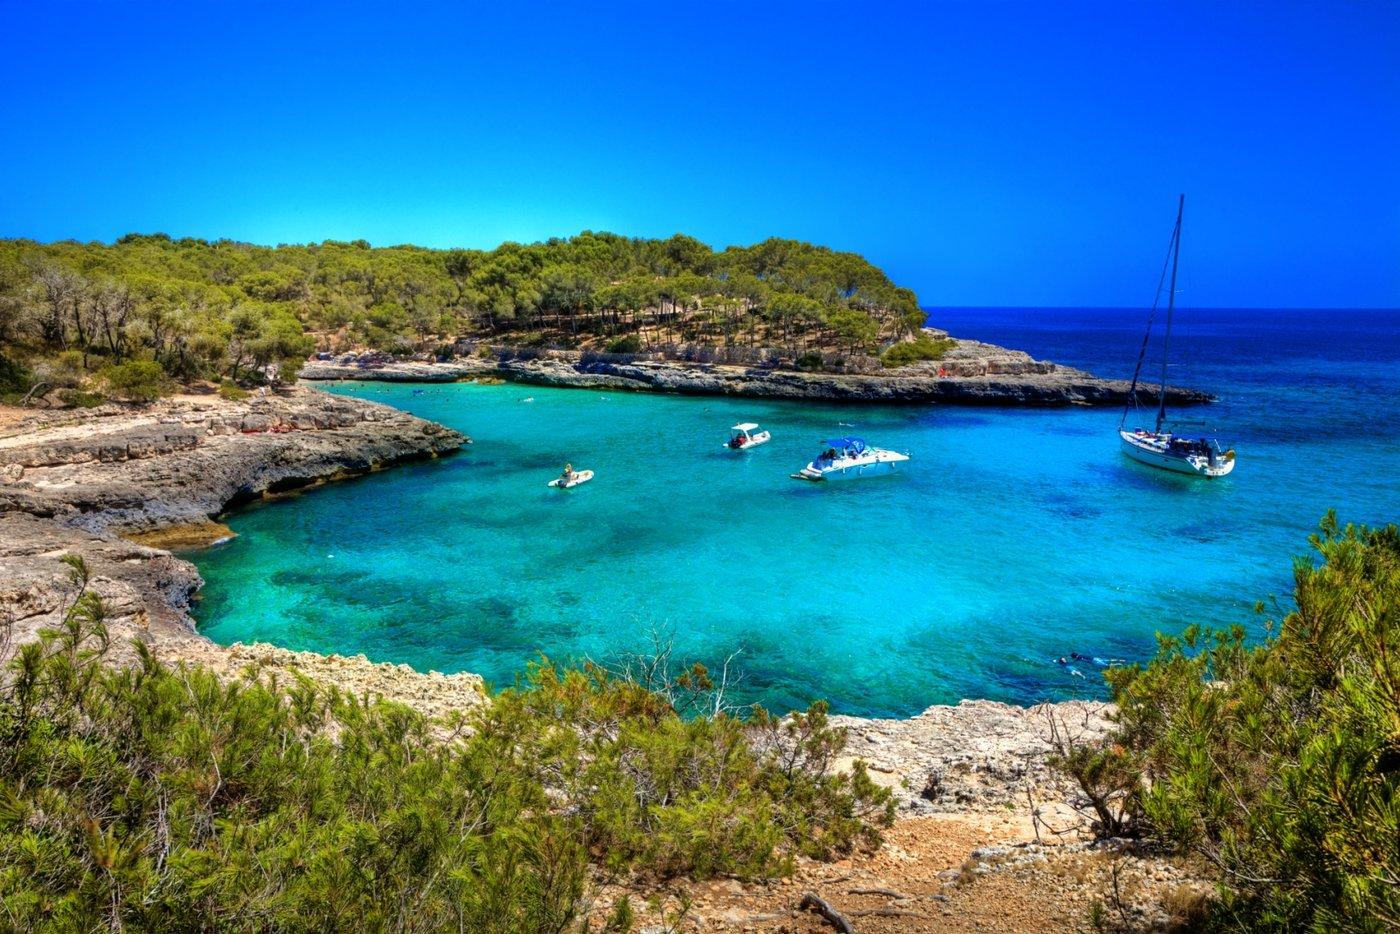 Photo Tour of The Balearics 5